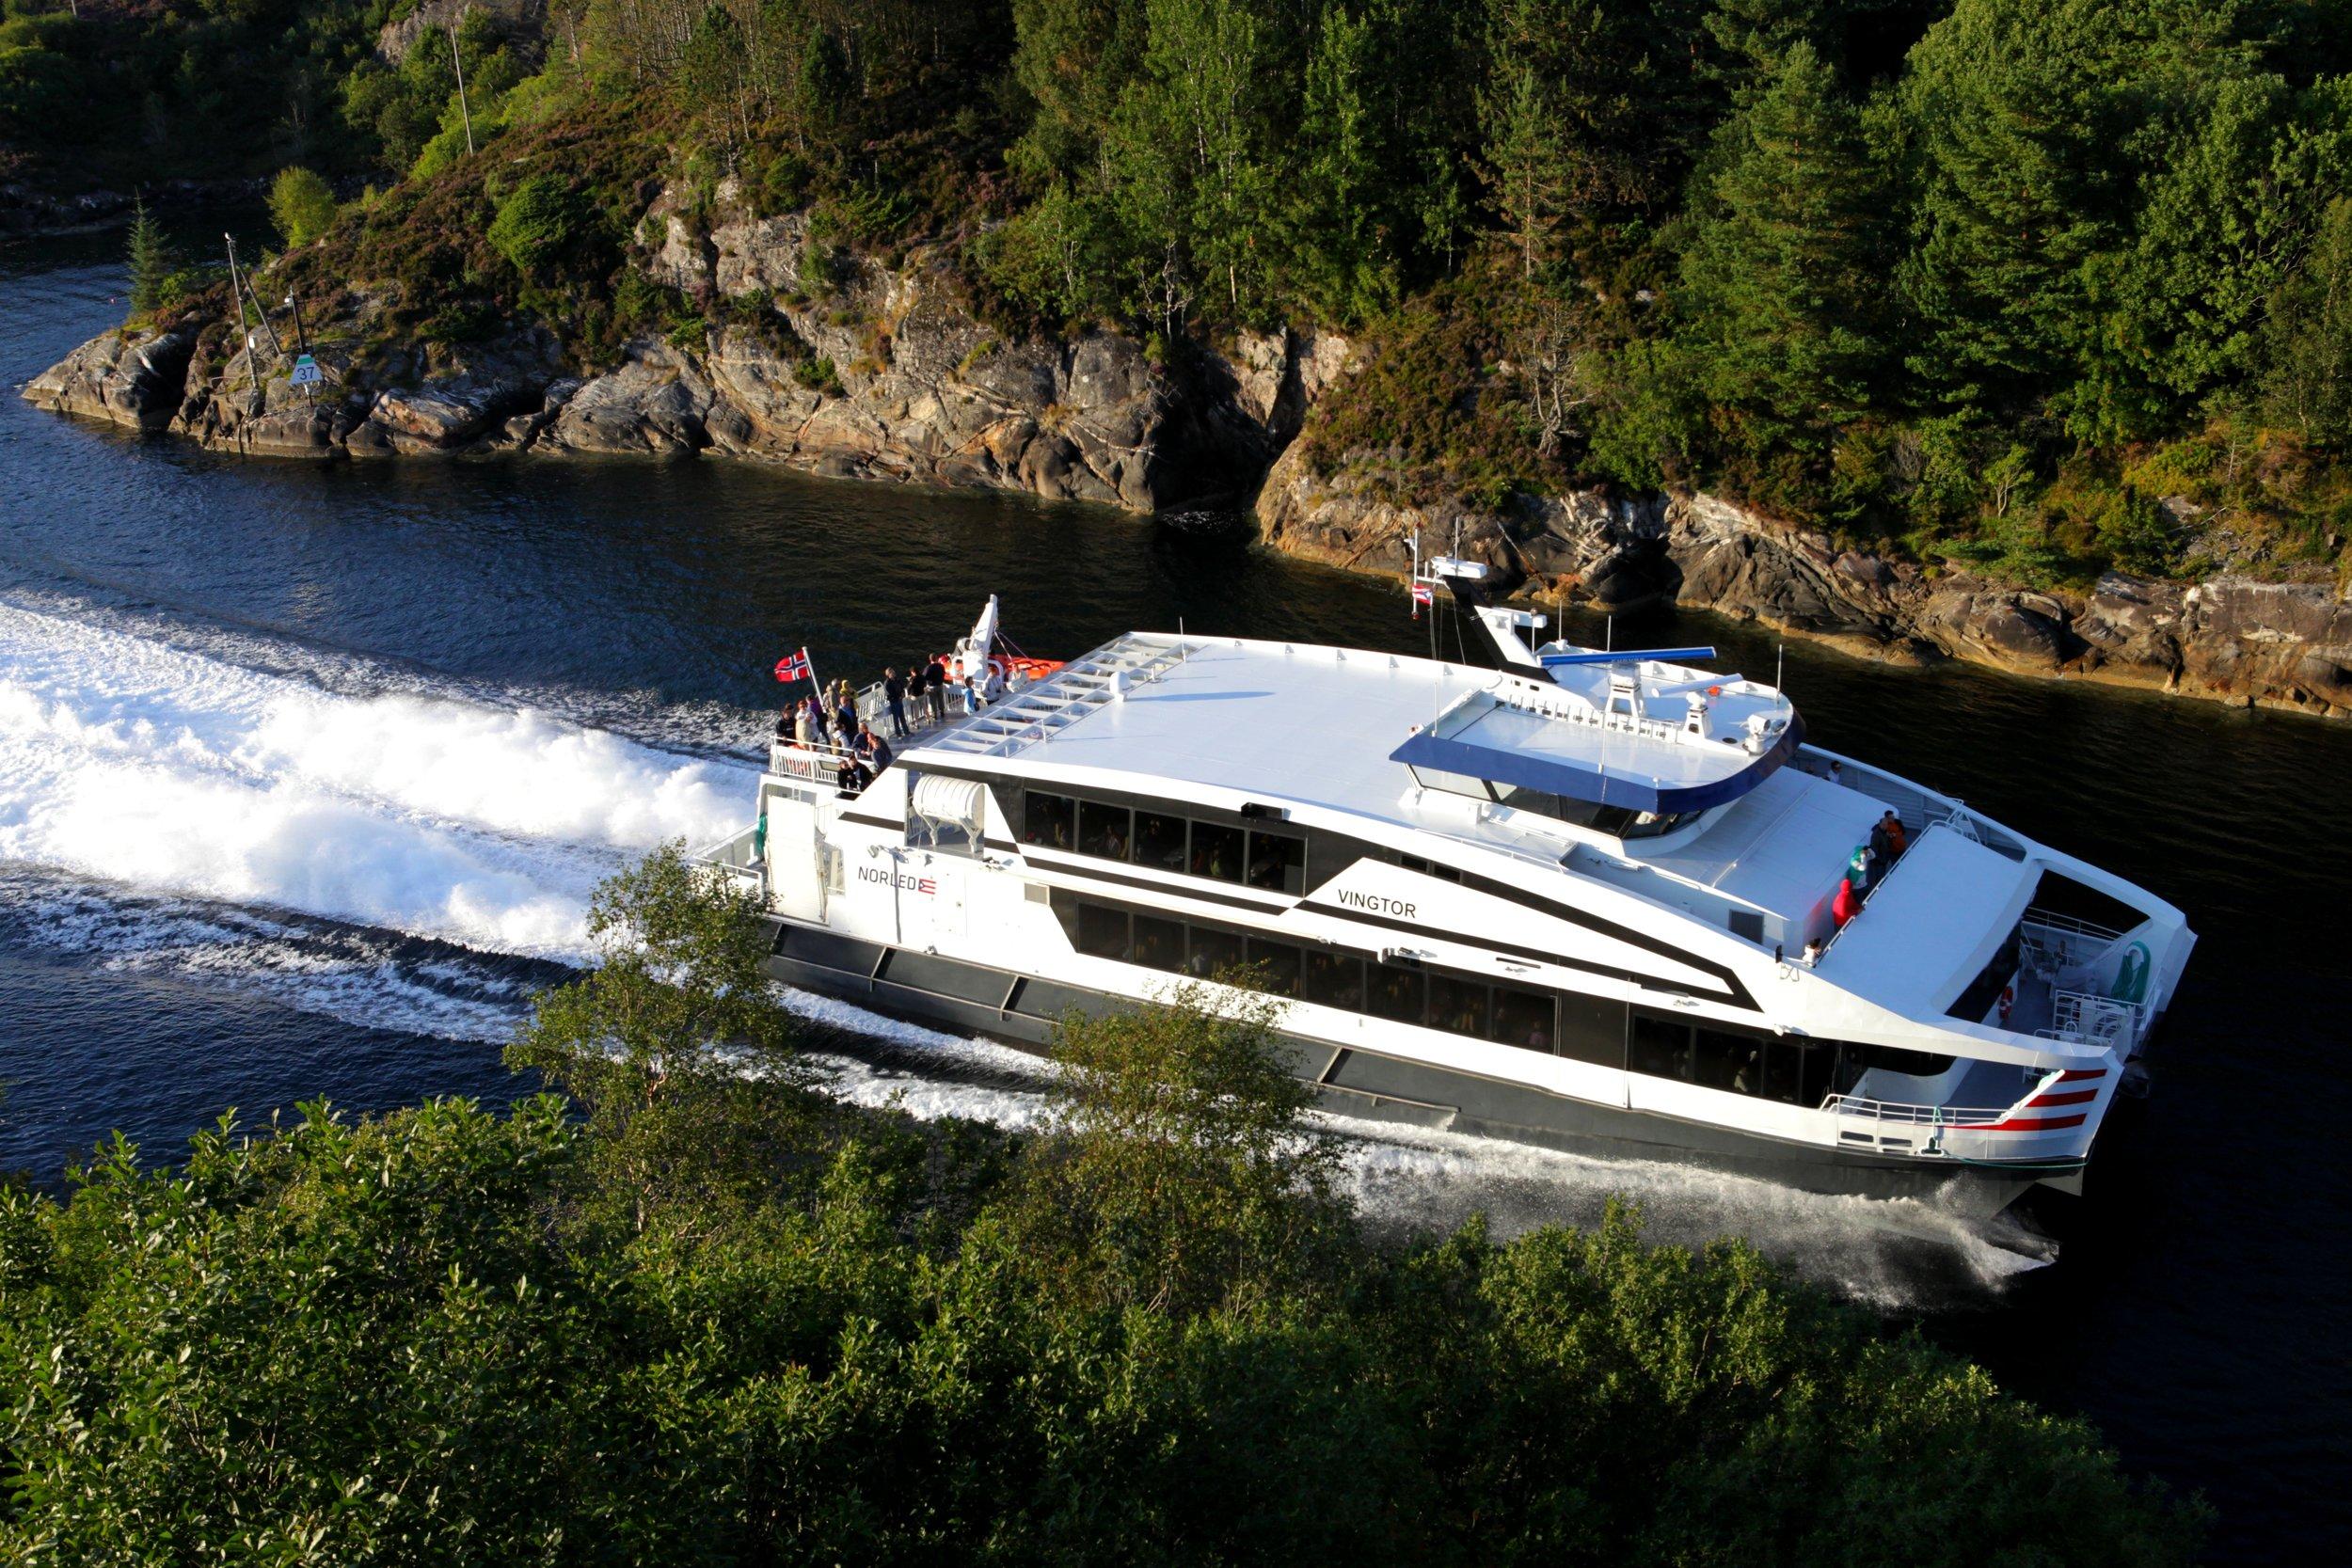 Hurtigbåt Bergen Sogn skjærgården.JPG